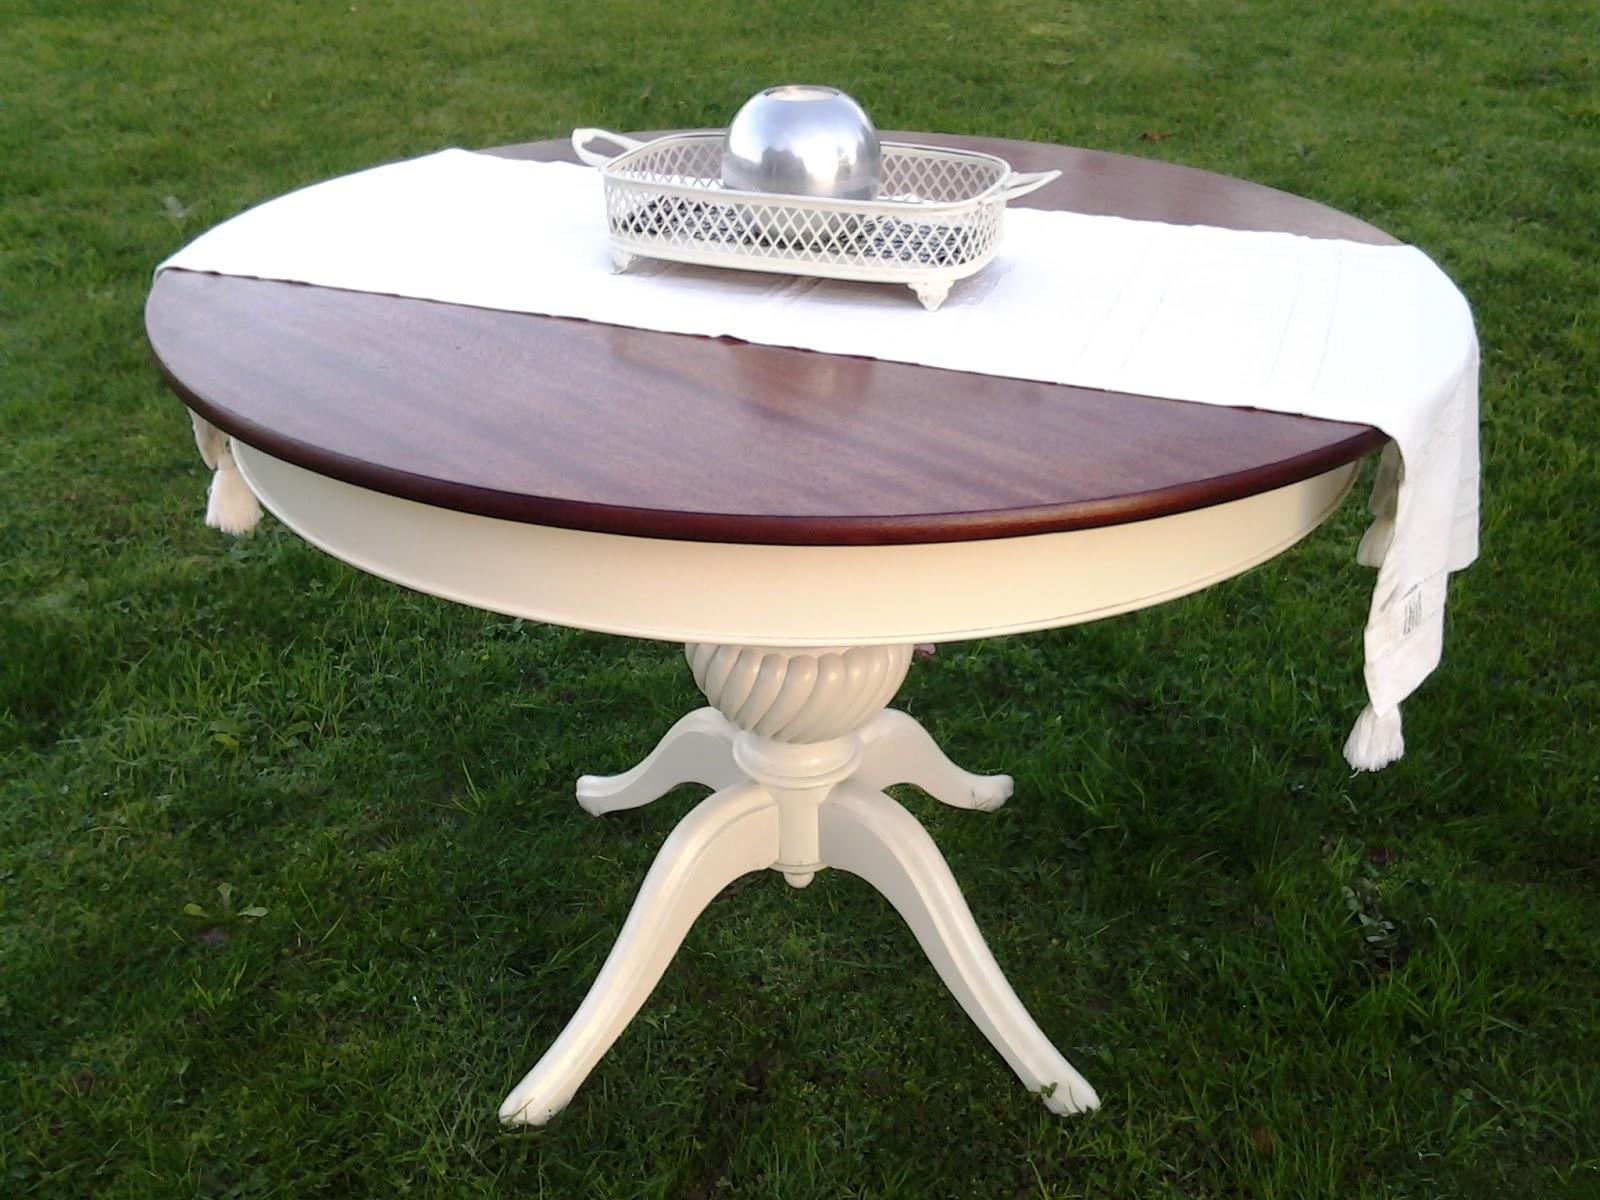 La almoneda de ana mesa de comedor con pata central for Mesa comedor pata central